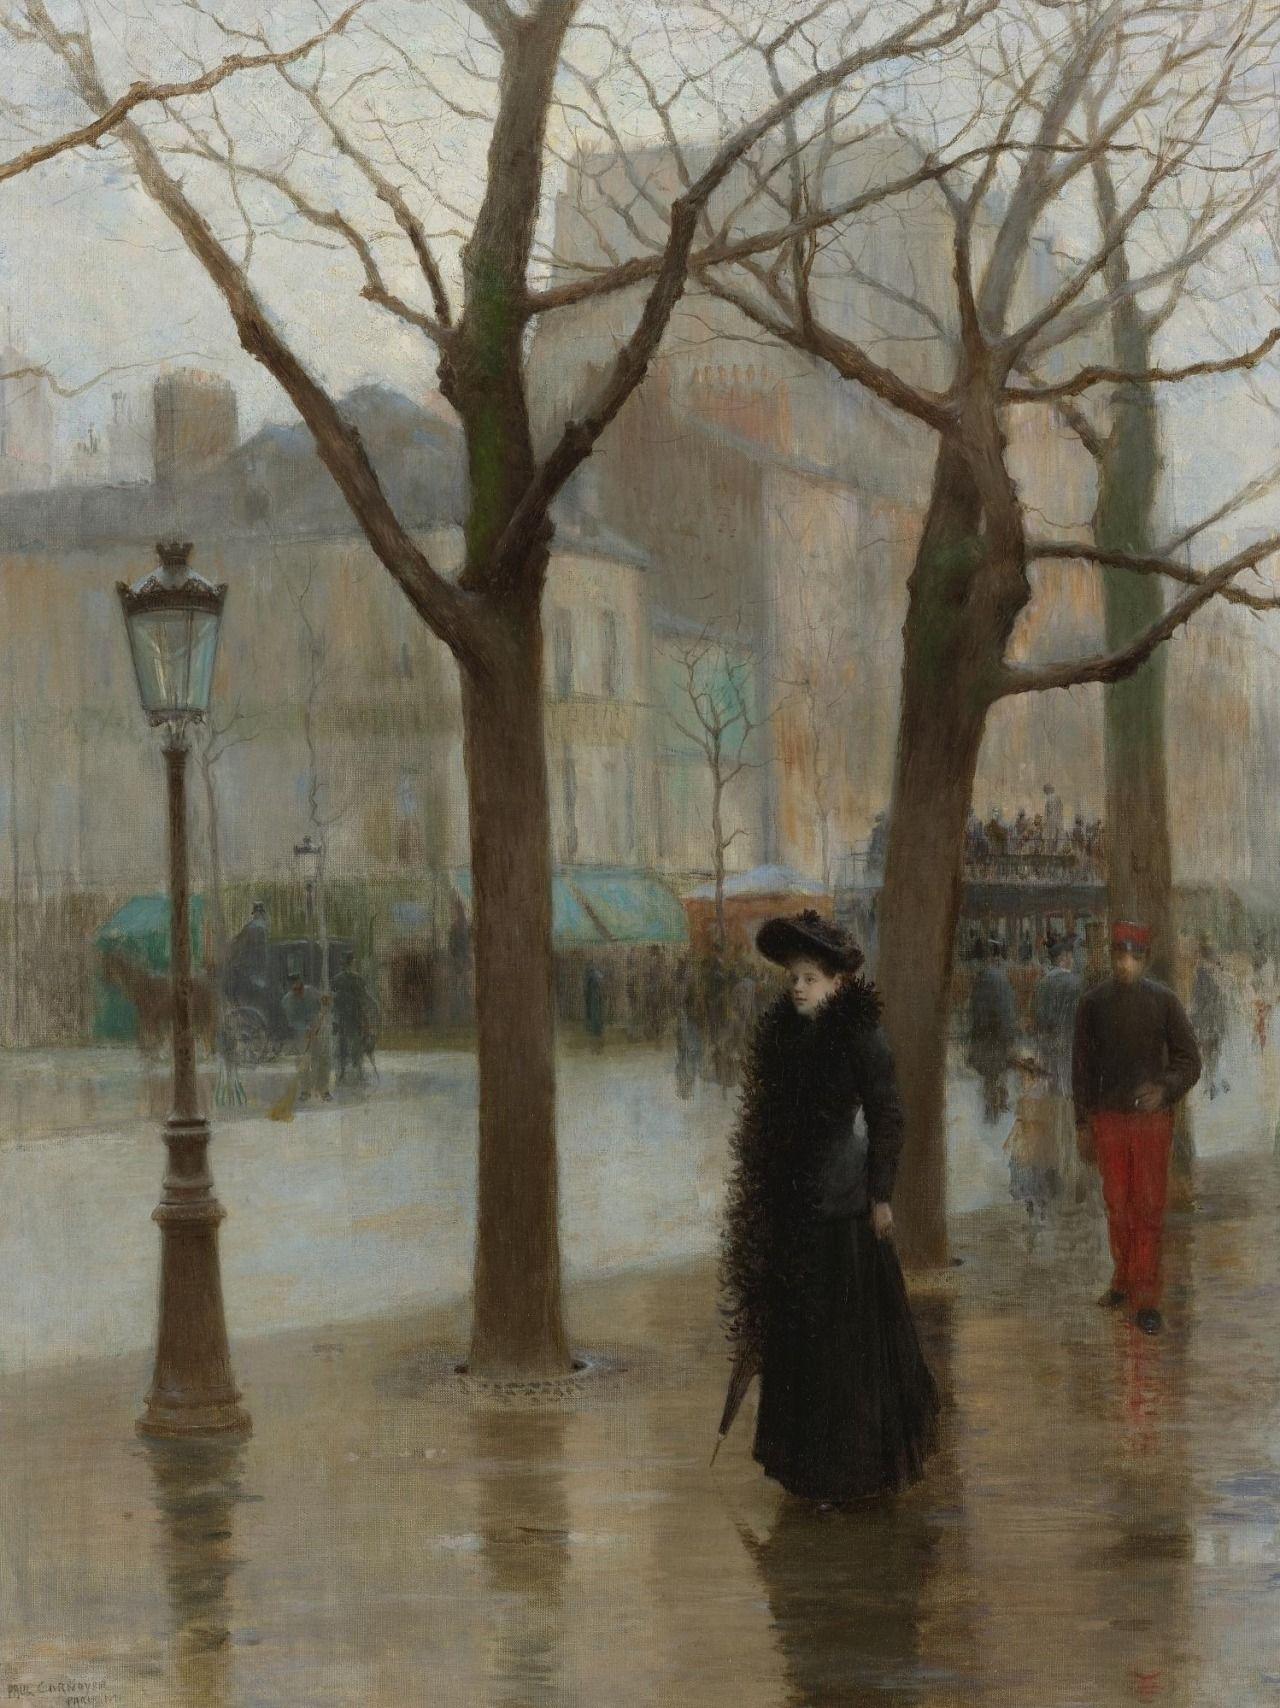 Paris Street in Winter, Paul Cornoyer